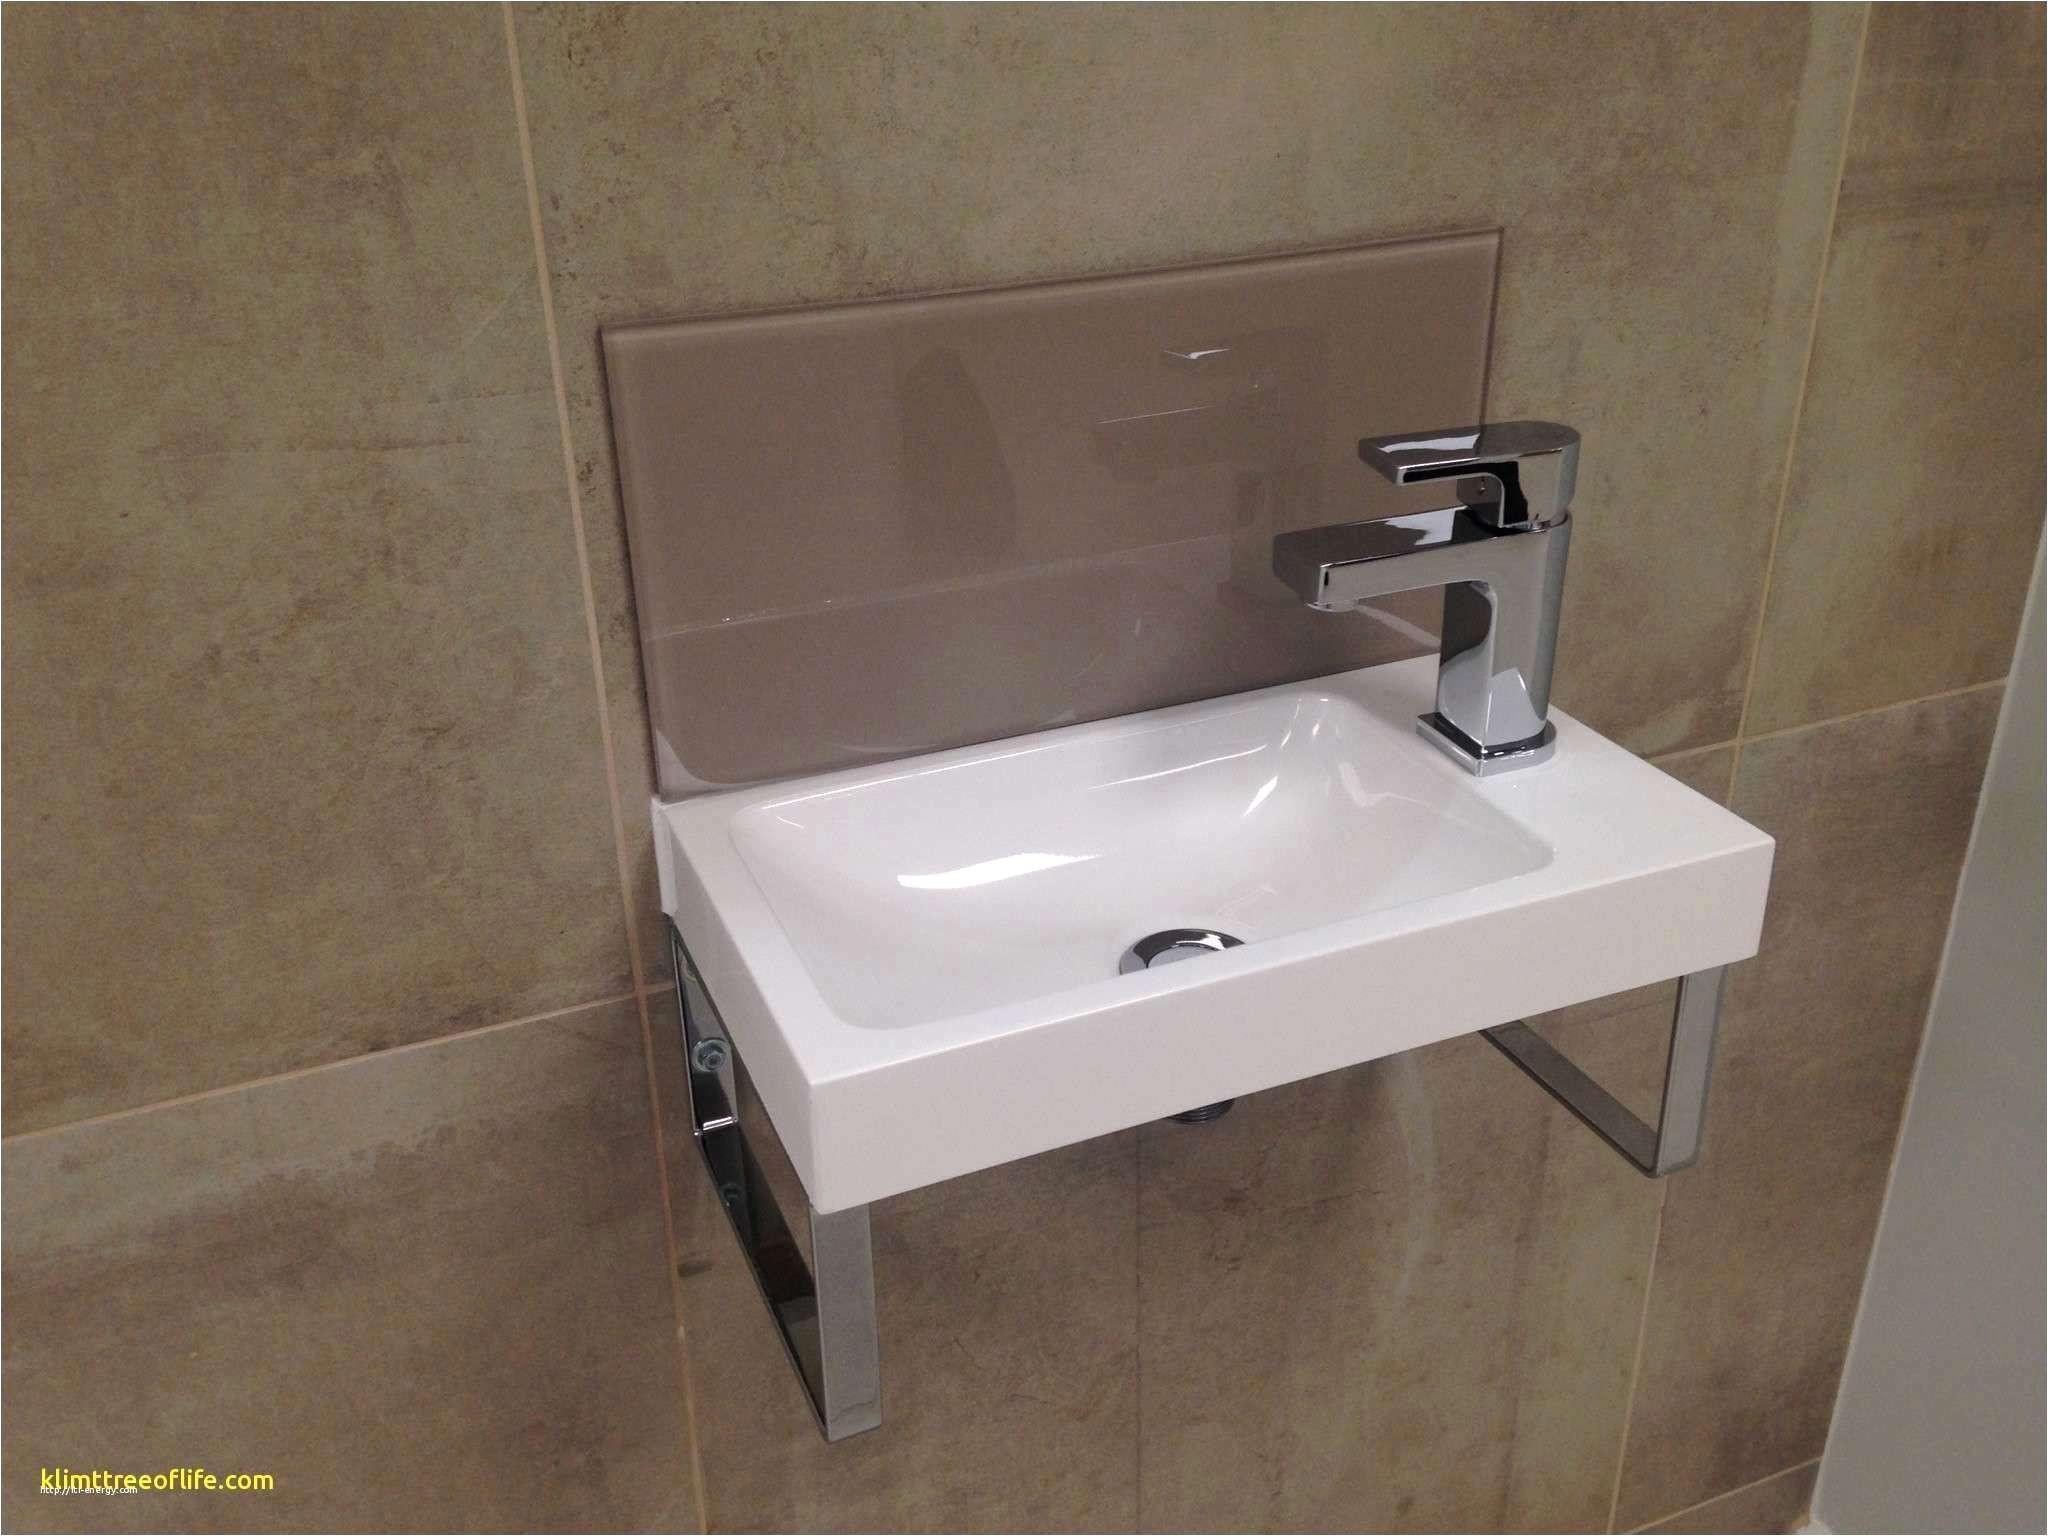 bathtub shower tile ideas fresh awesome bathroom picture ideas lovely tag toilet ideas 0d best